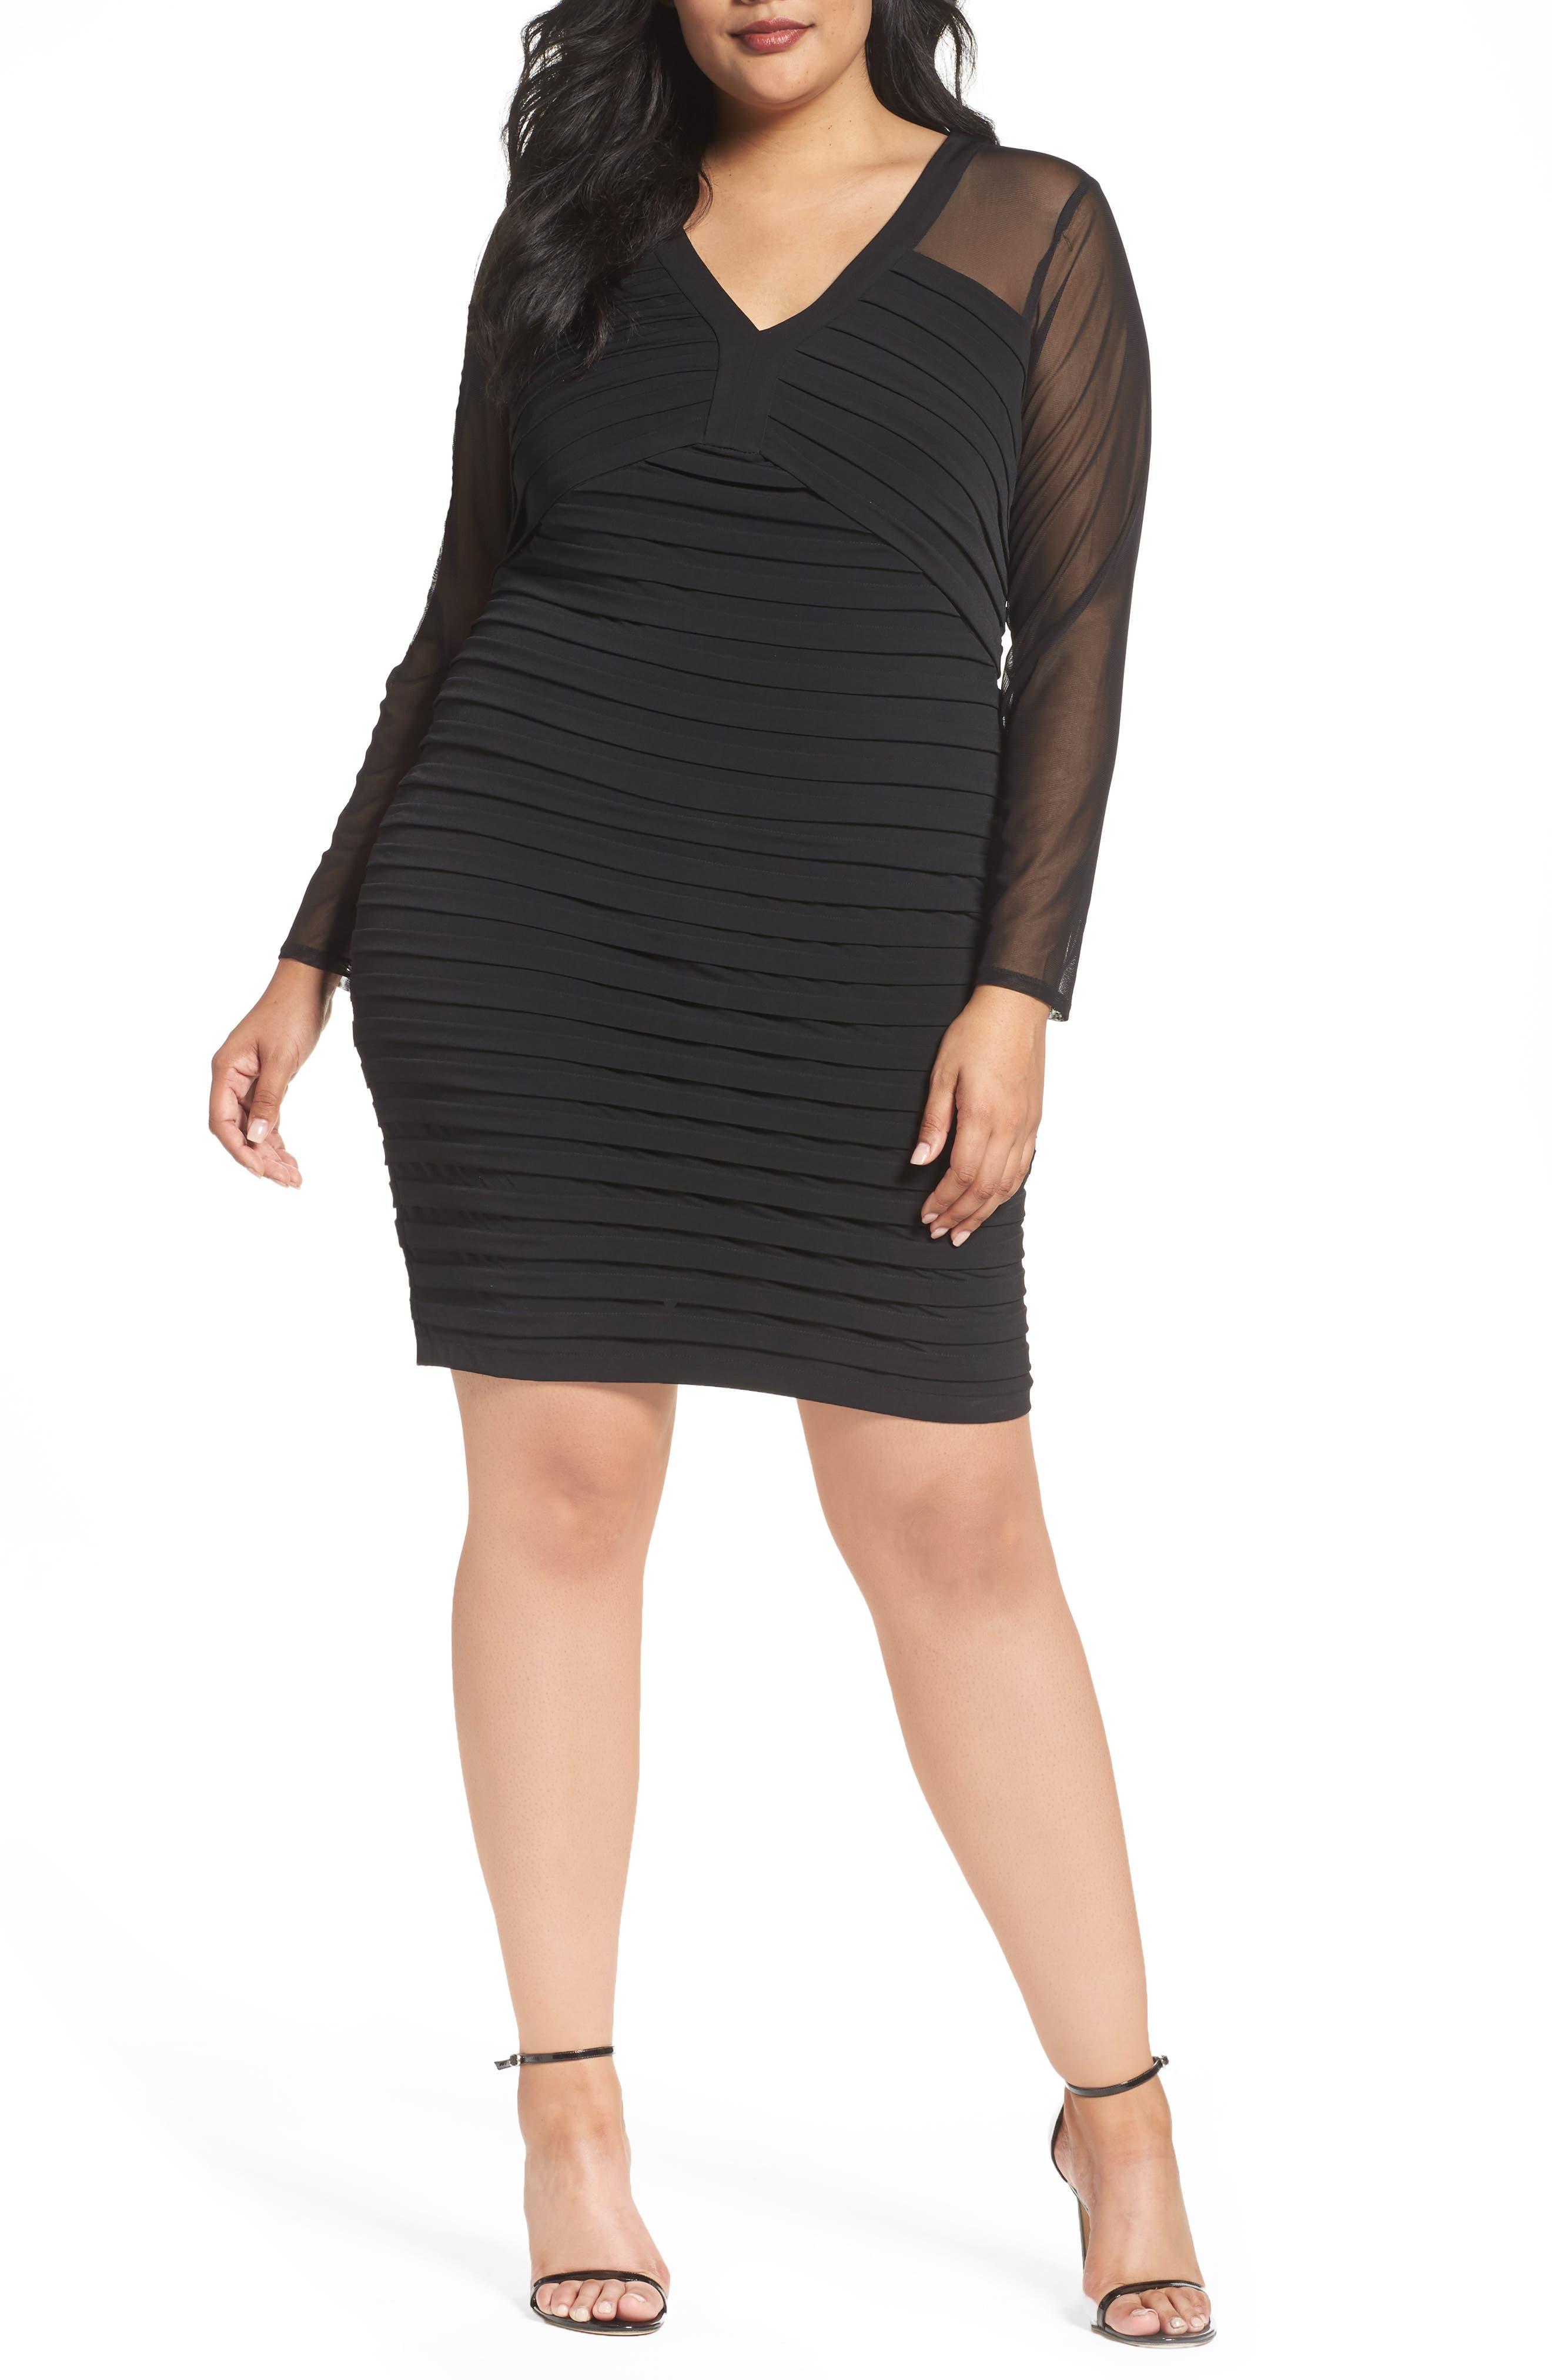 Shutter Pleat Jersey Skeath Dress,                             Main thumbnail 1, color,                             BLACK